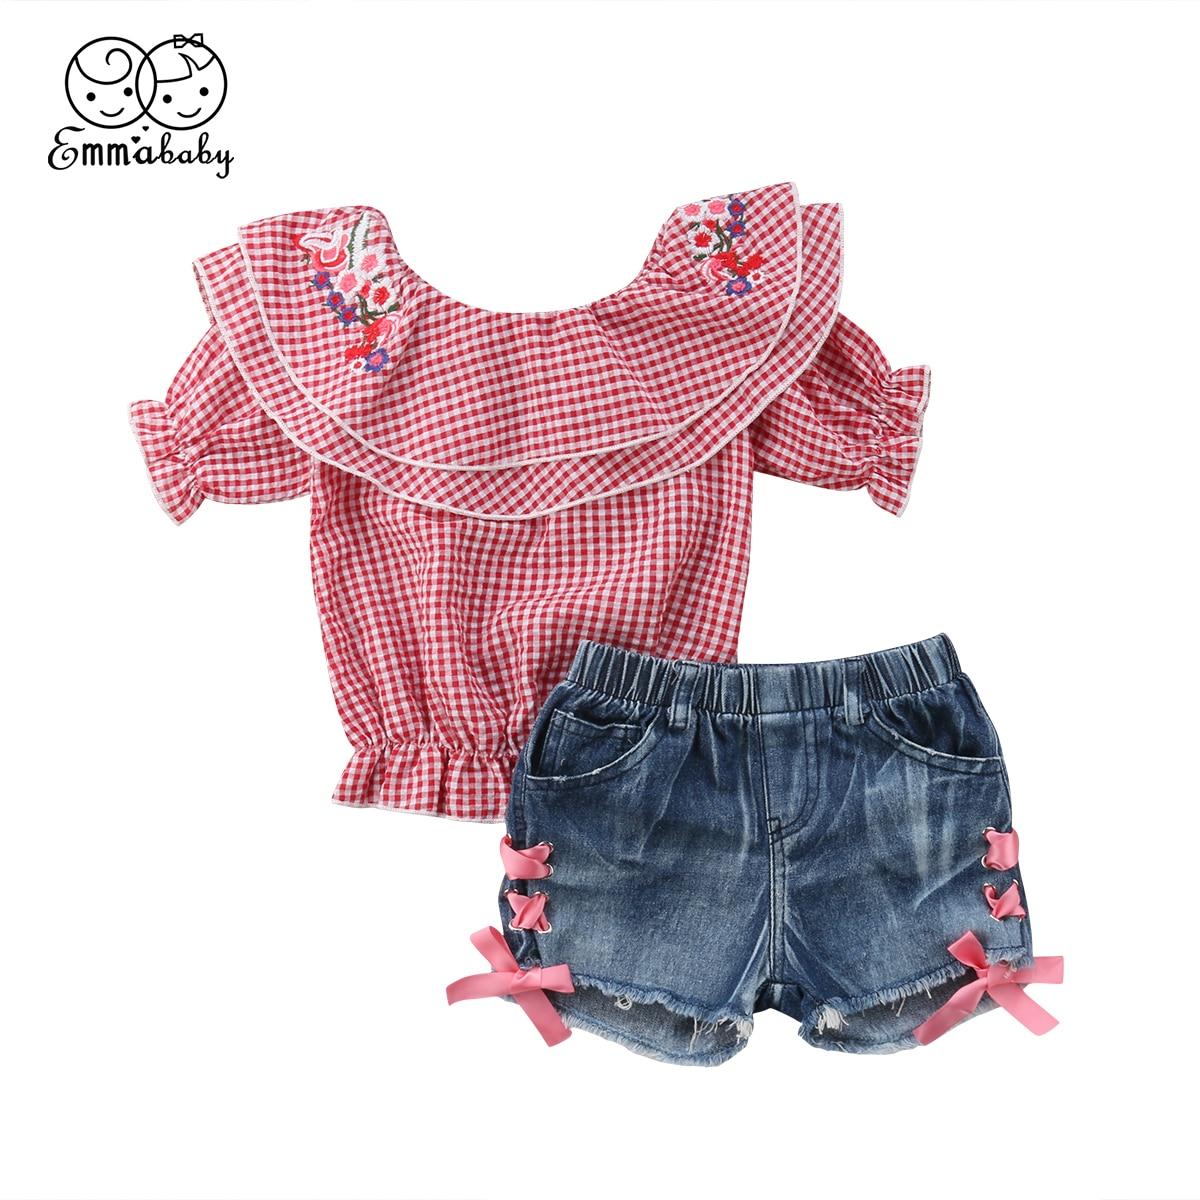 7e055edf2 Summer New Fashion Newborn Kids Baby Girls Off Shoulder Ruffles Palid Tops  Shirt Denim Pants Shorts 2Pcs Cute Kid Outfit Sets